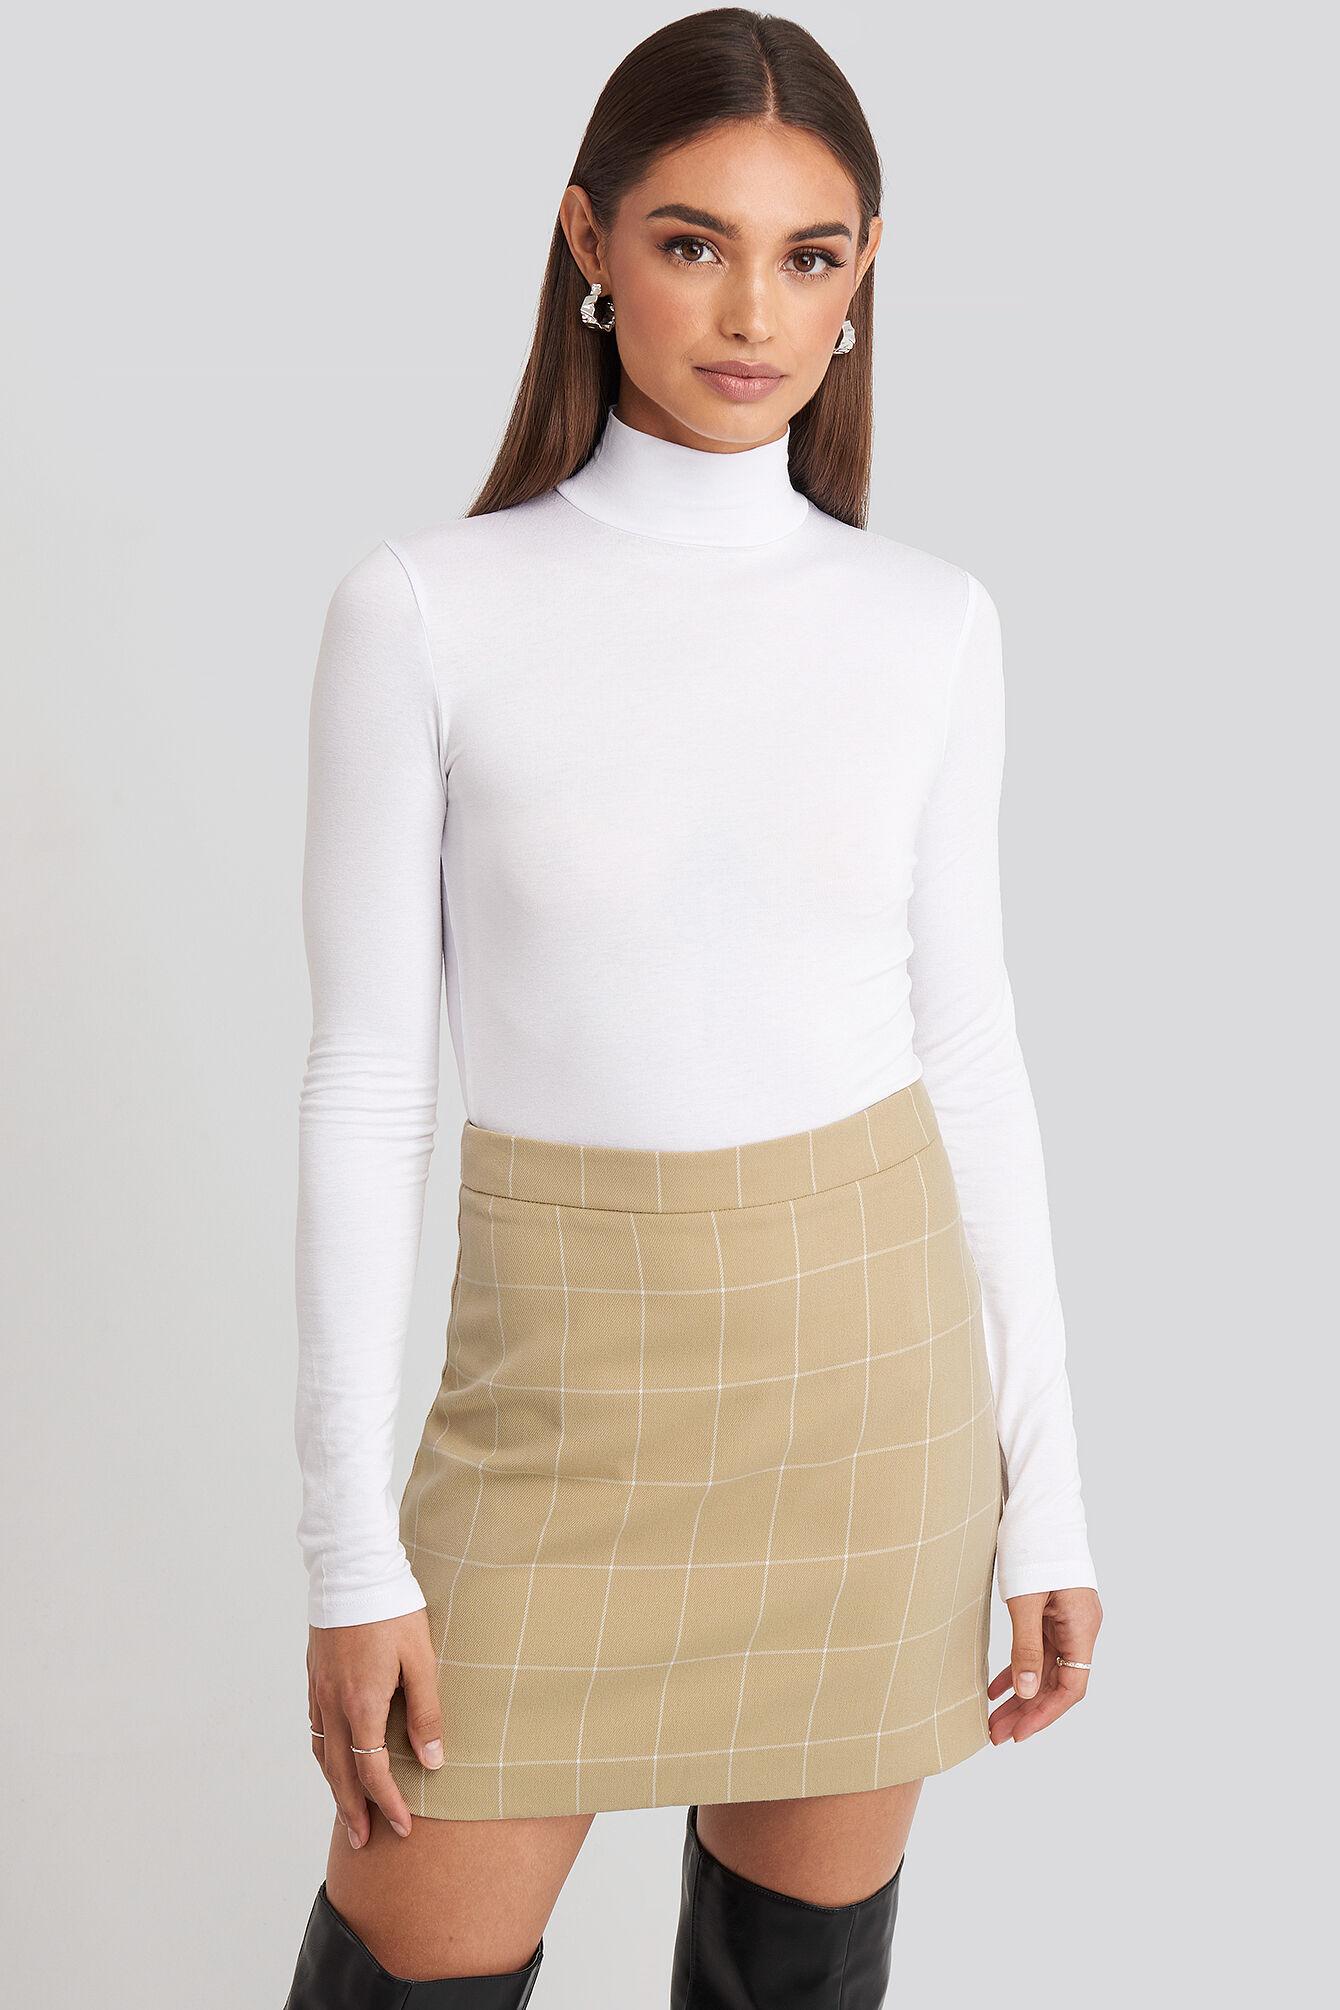 Hoss x NA-KD Checked Mini Skirt - Beige